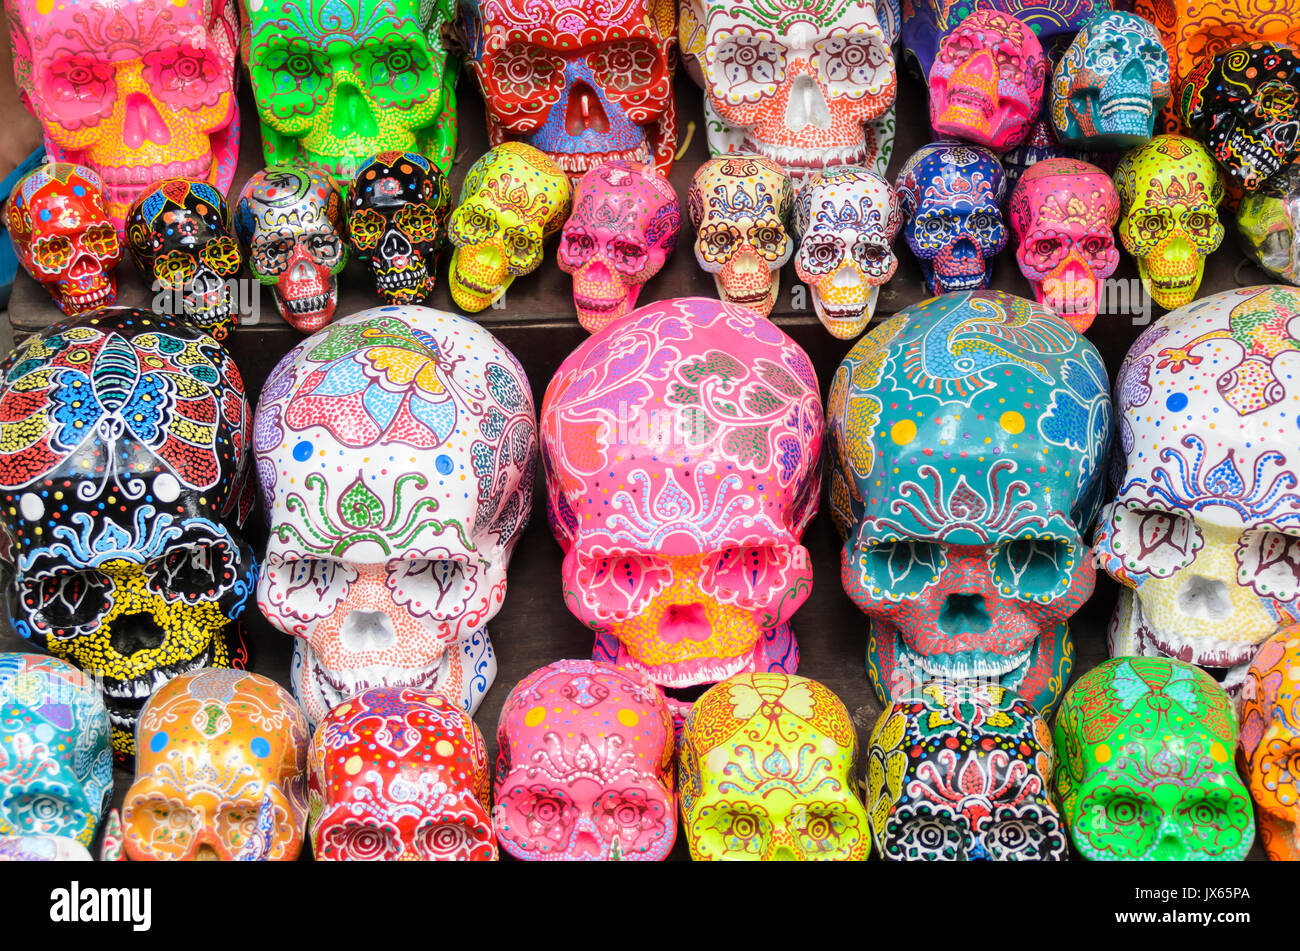 Decorative skulls for sale at the Ubud Market, Bali, Indonesia - Stock Image